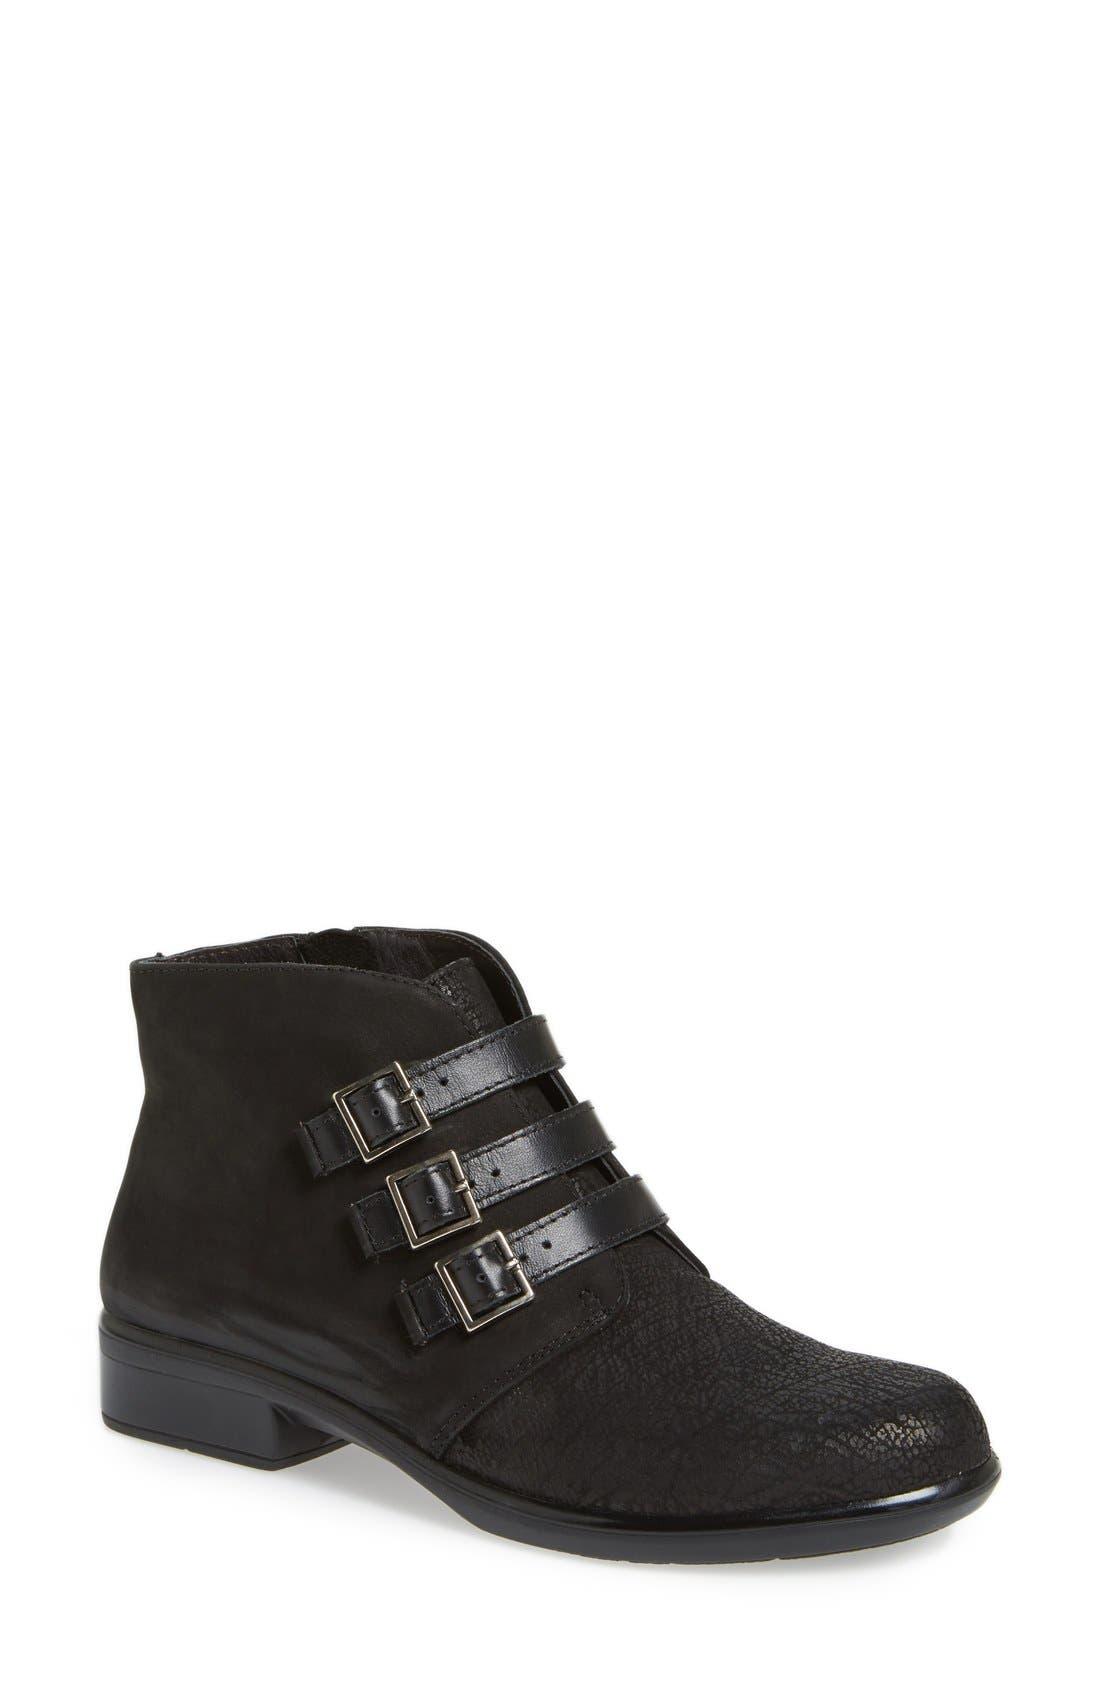 'Calima' Bootie,                             Main thumbnail 1, color,                             Black Crackle Leather